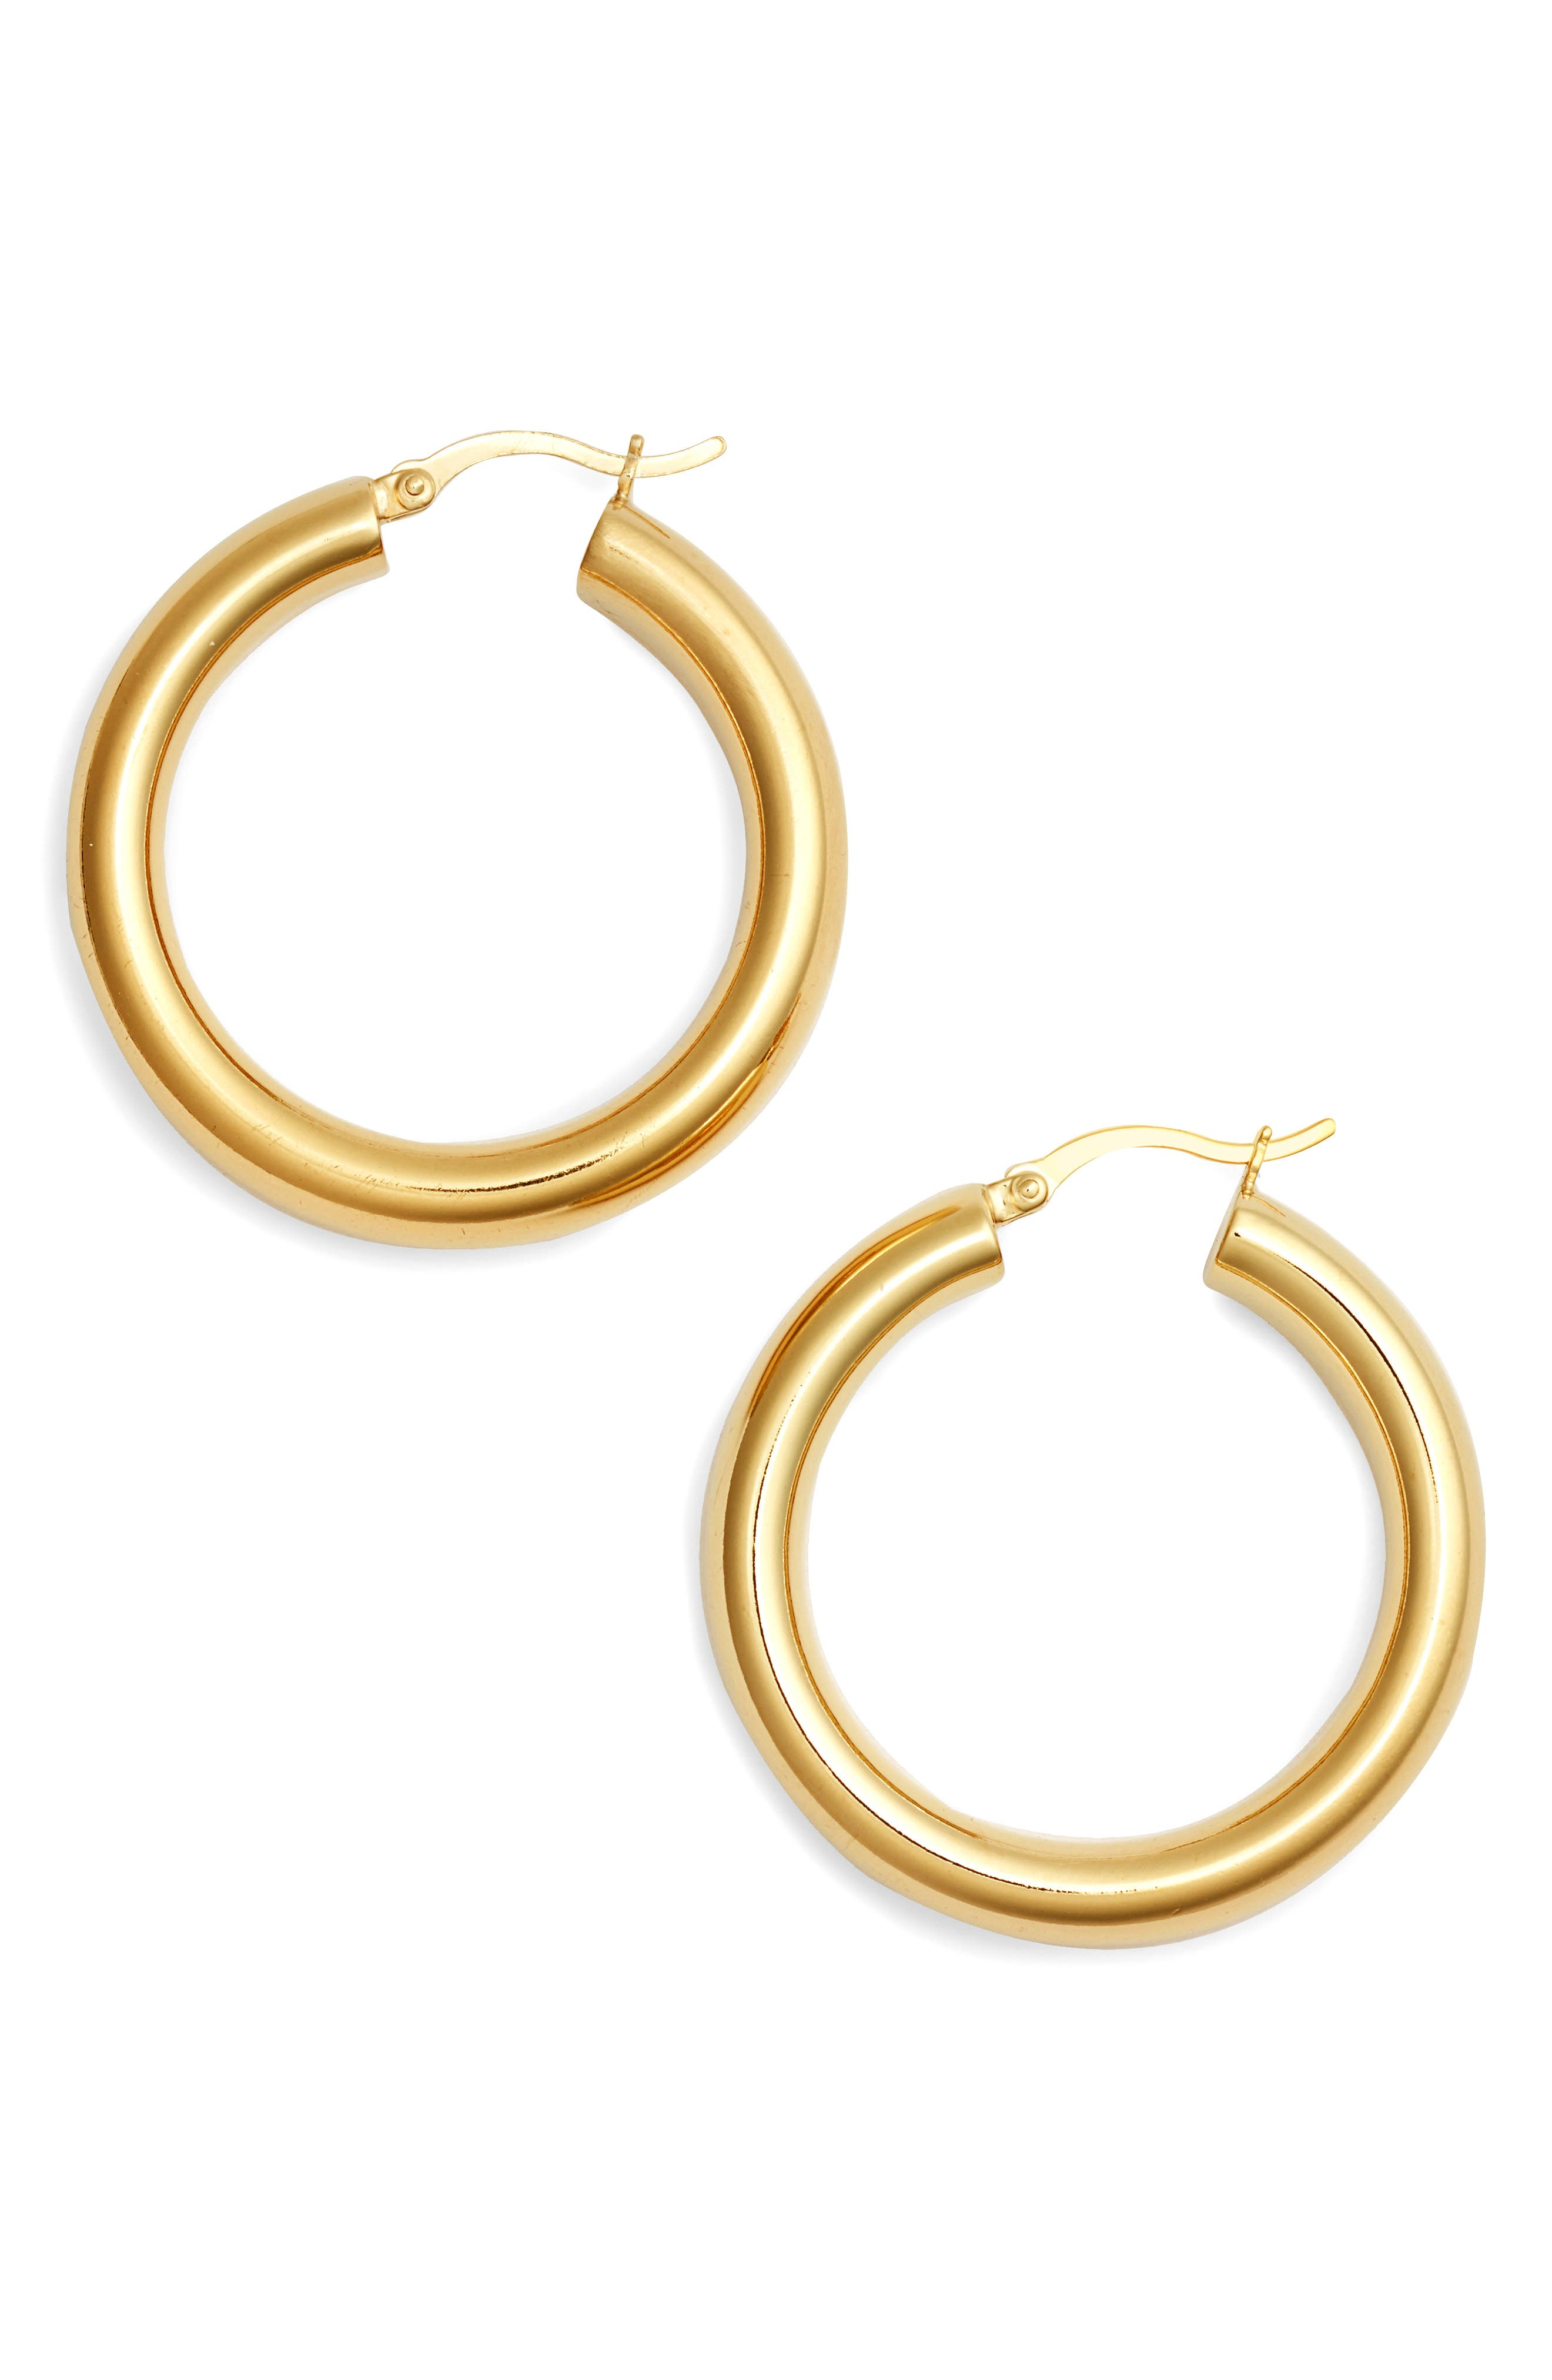 Small Hoop Earrings,                             Main thumbnail 1, color,                             GOLD